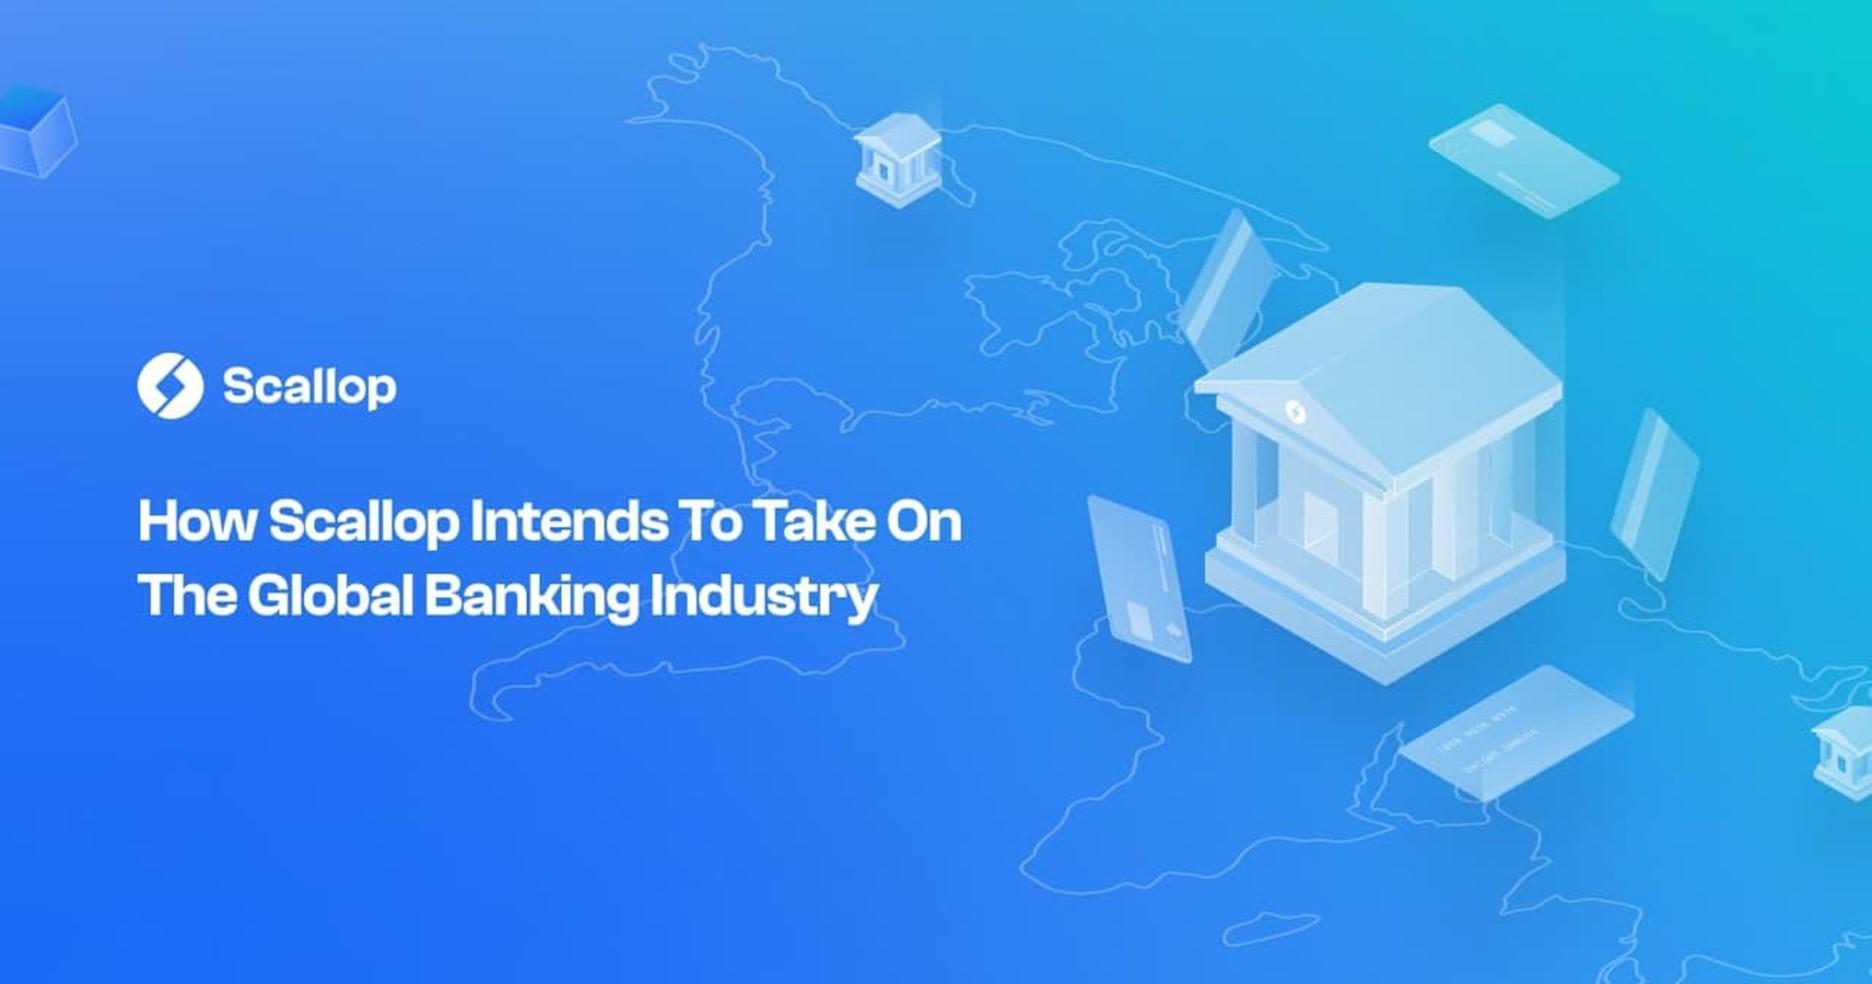 Cómo pretende Scallop enfrentarse a la industria bancaria mundial